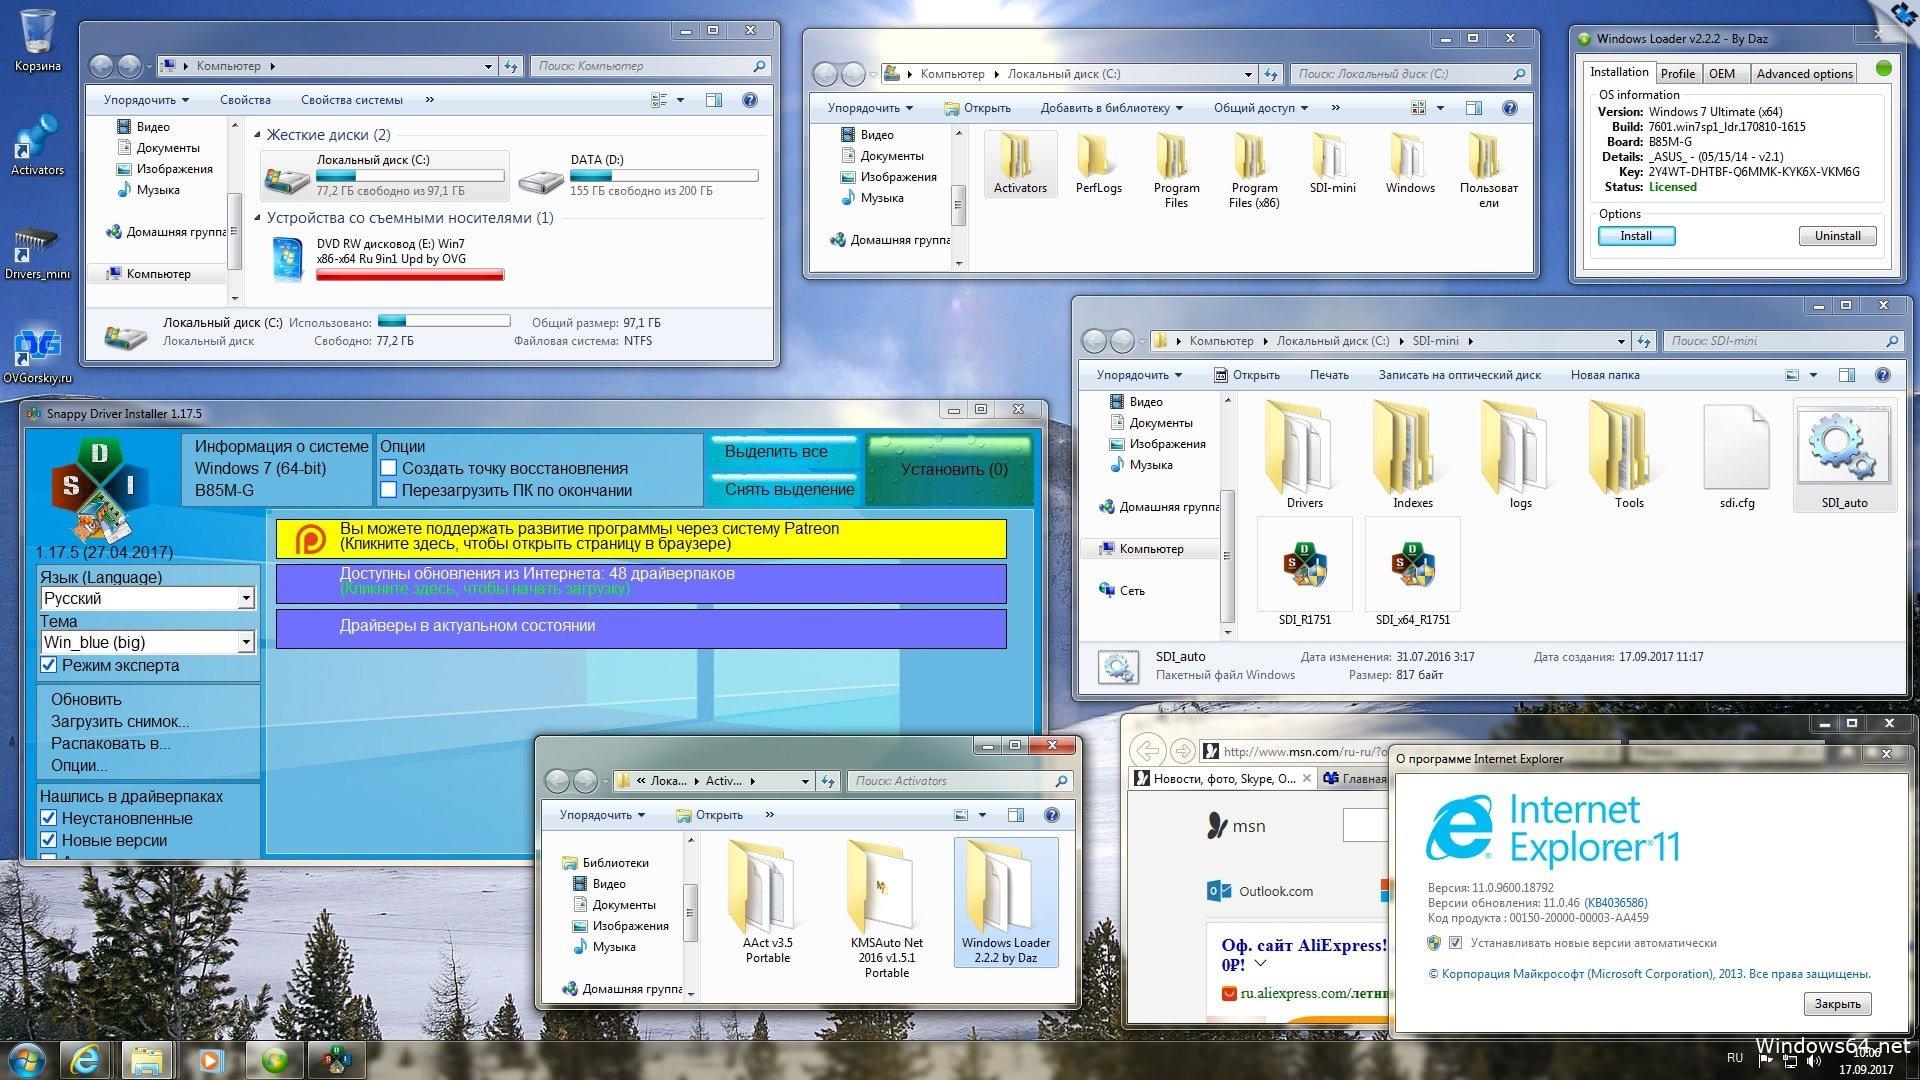 код активация windows 7 максимальная сборка 7601